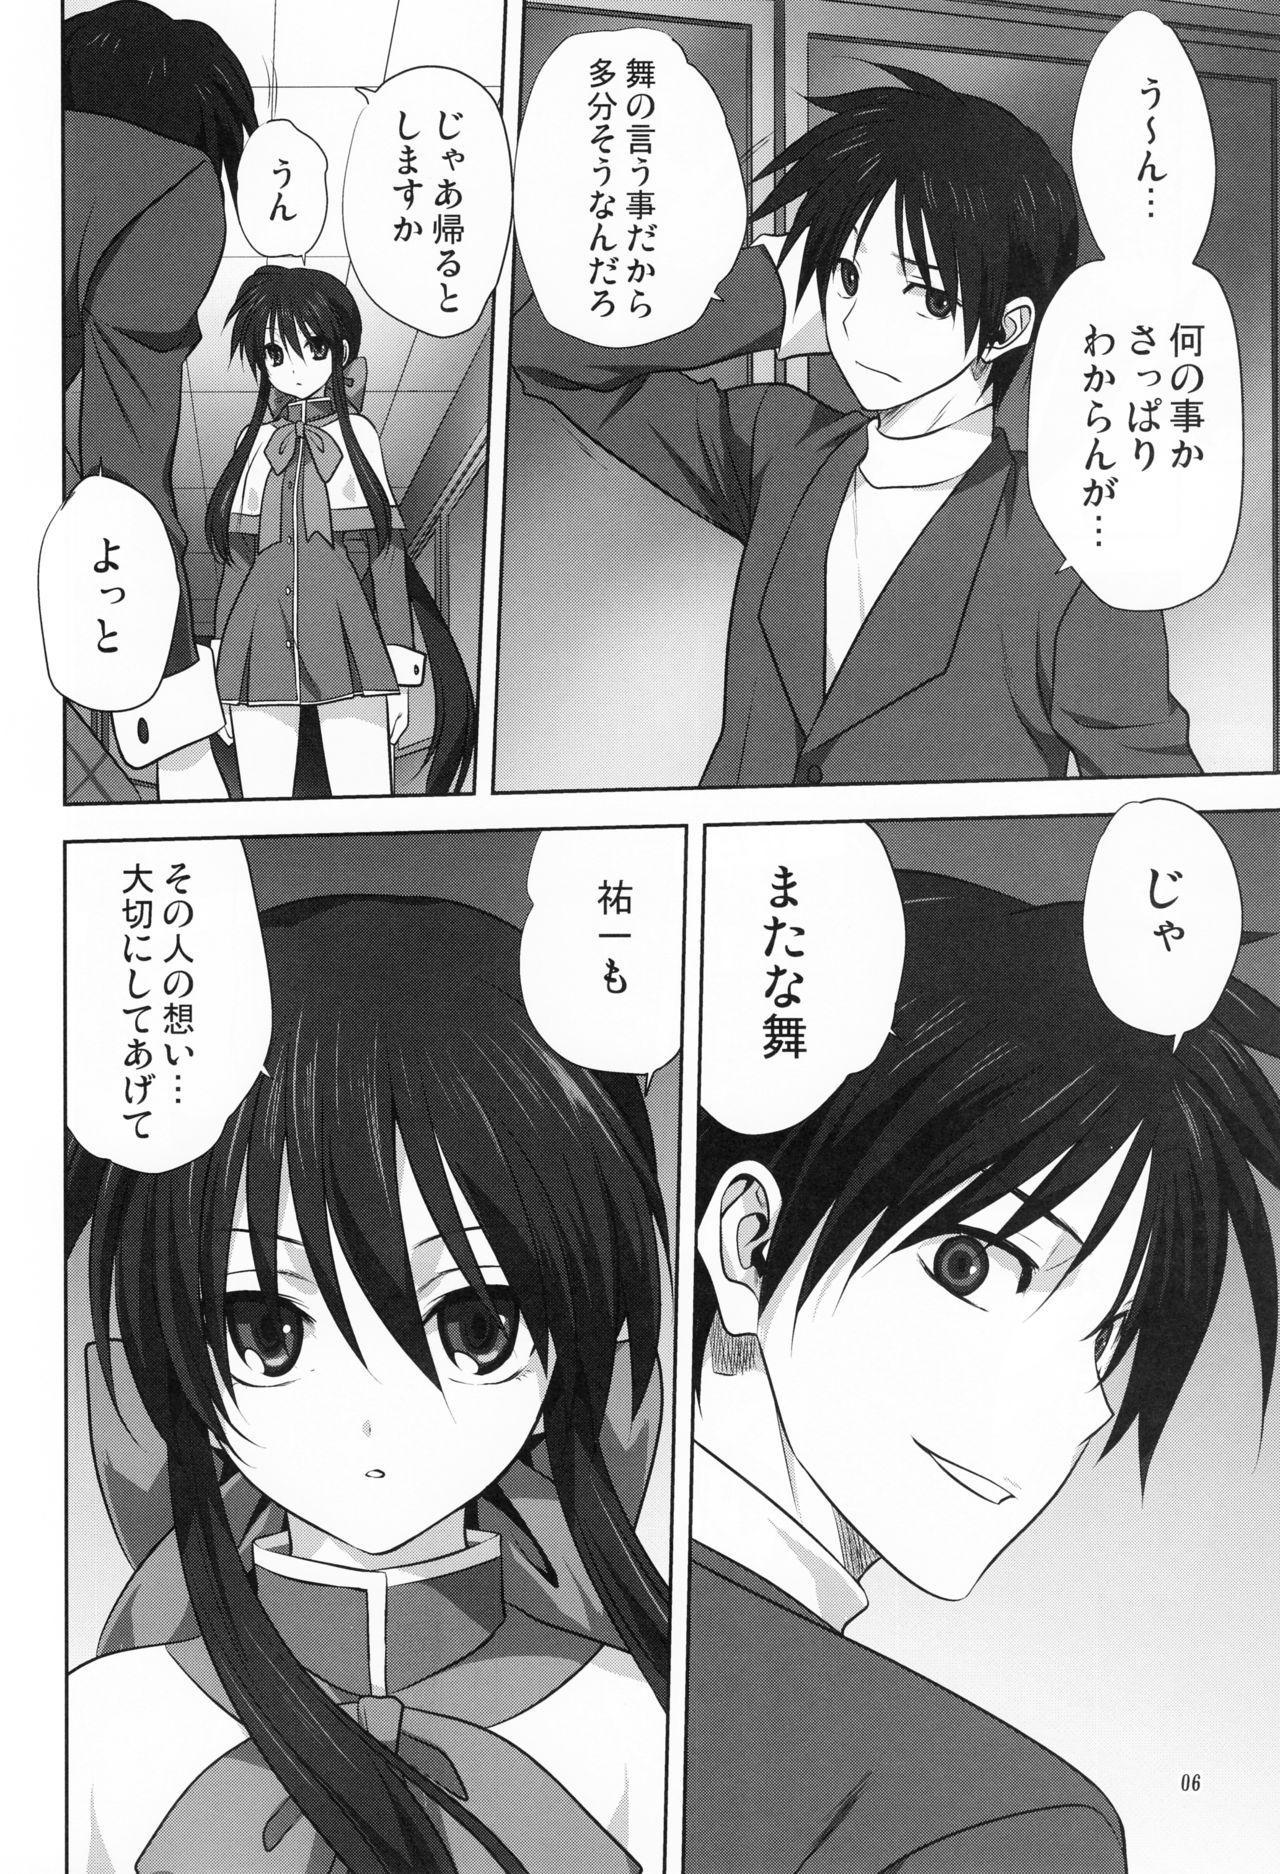 Akiko-san to Issho 18 4